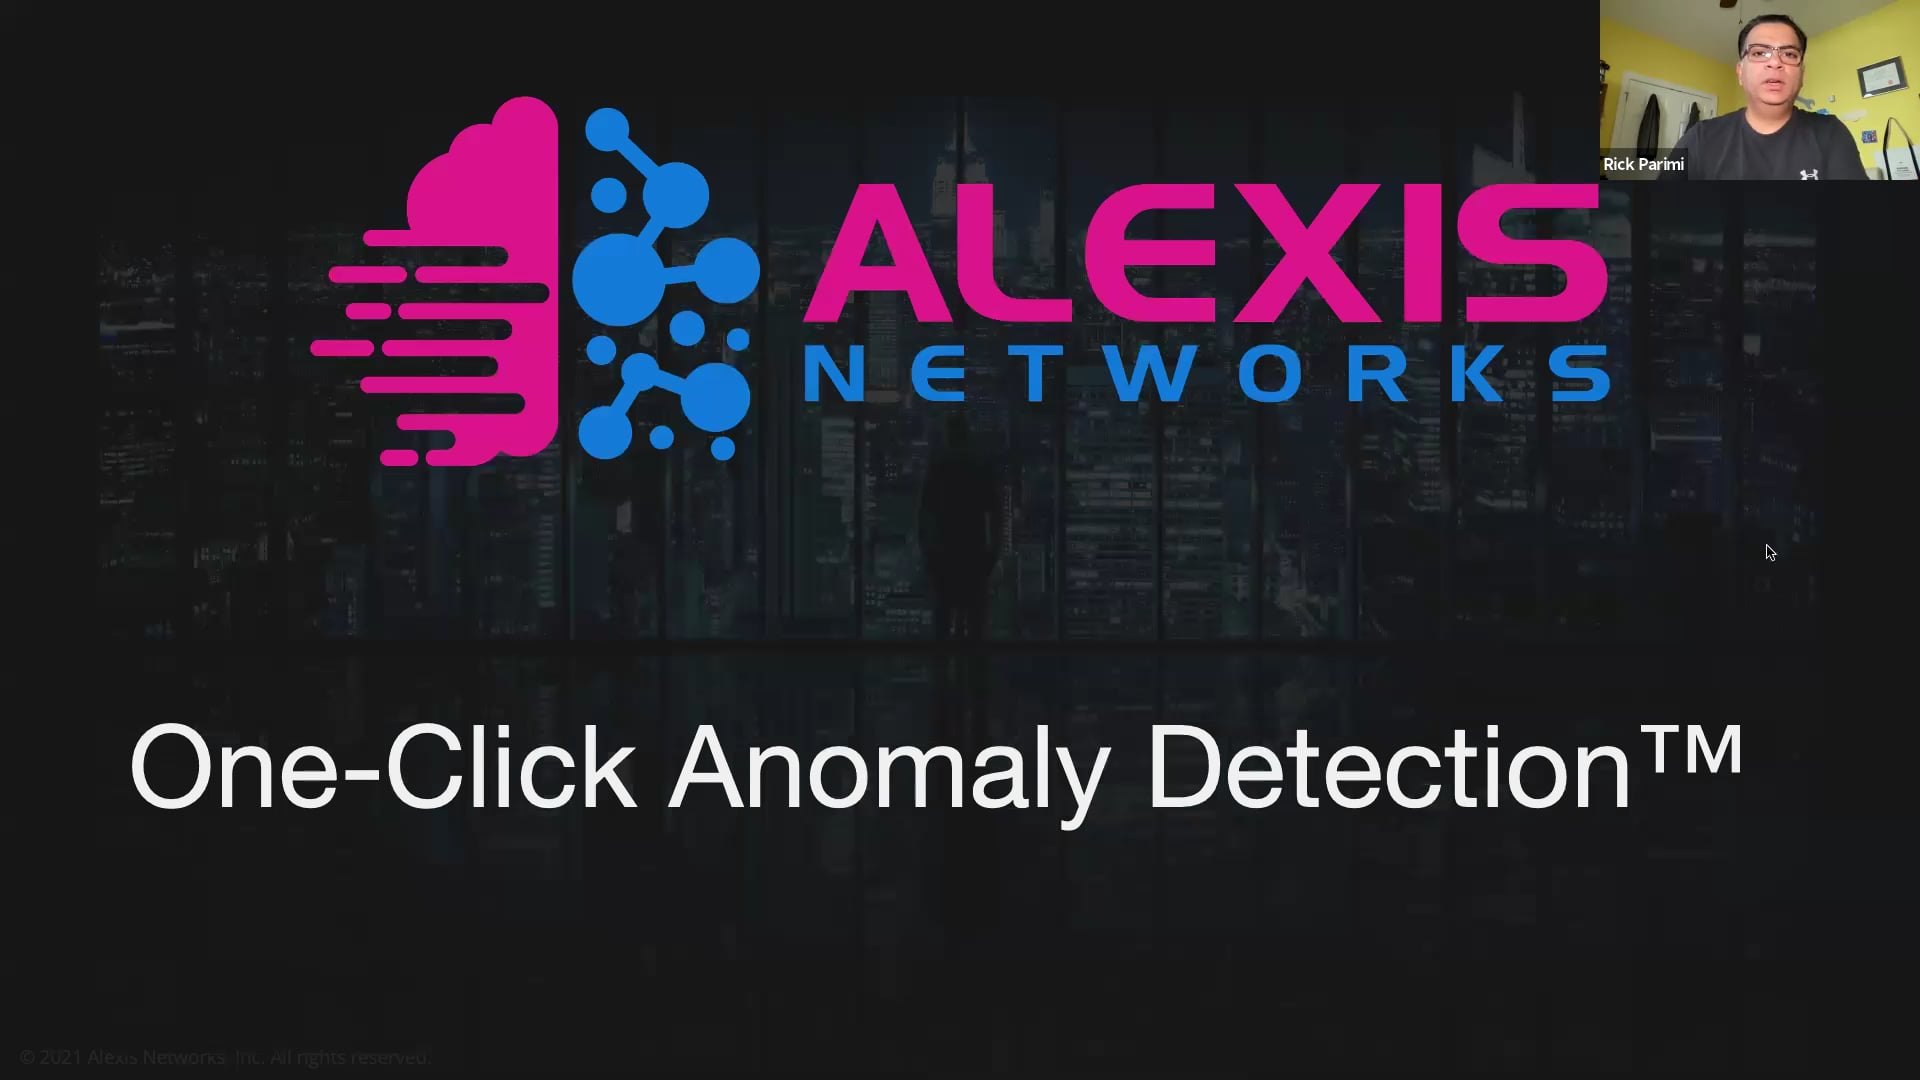 ALEXIS - The Problem